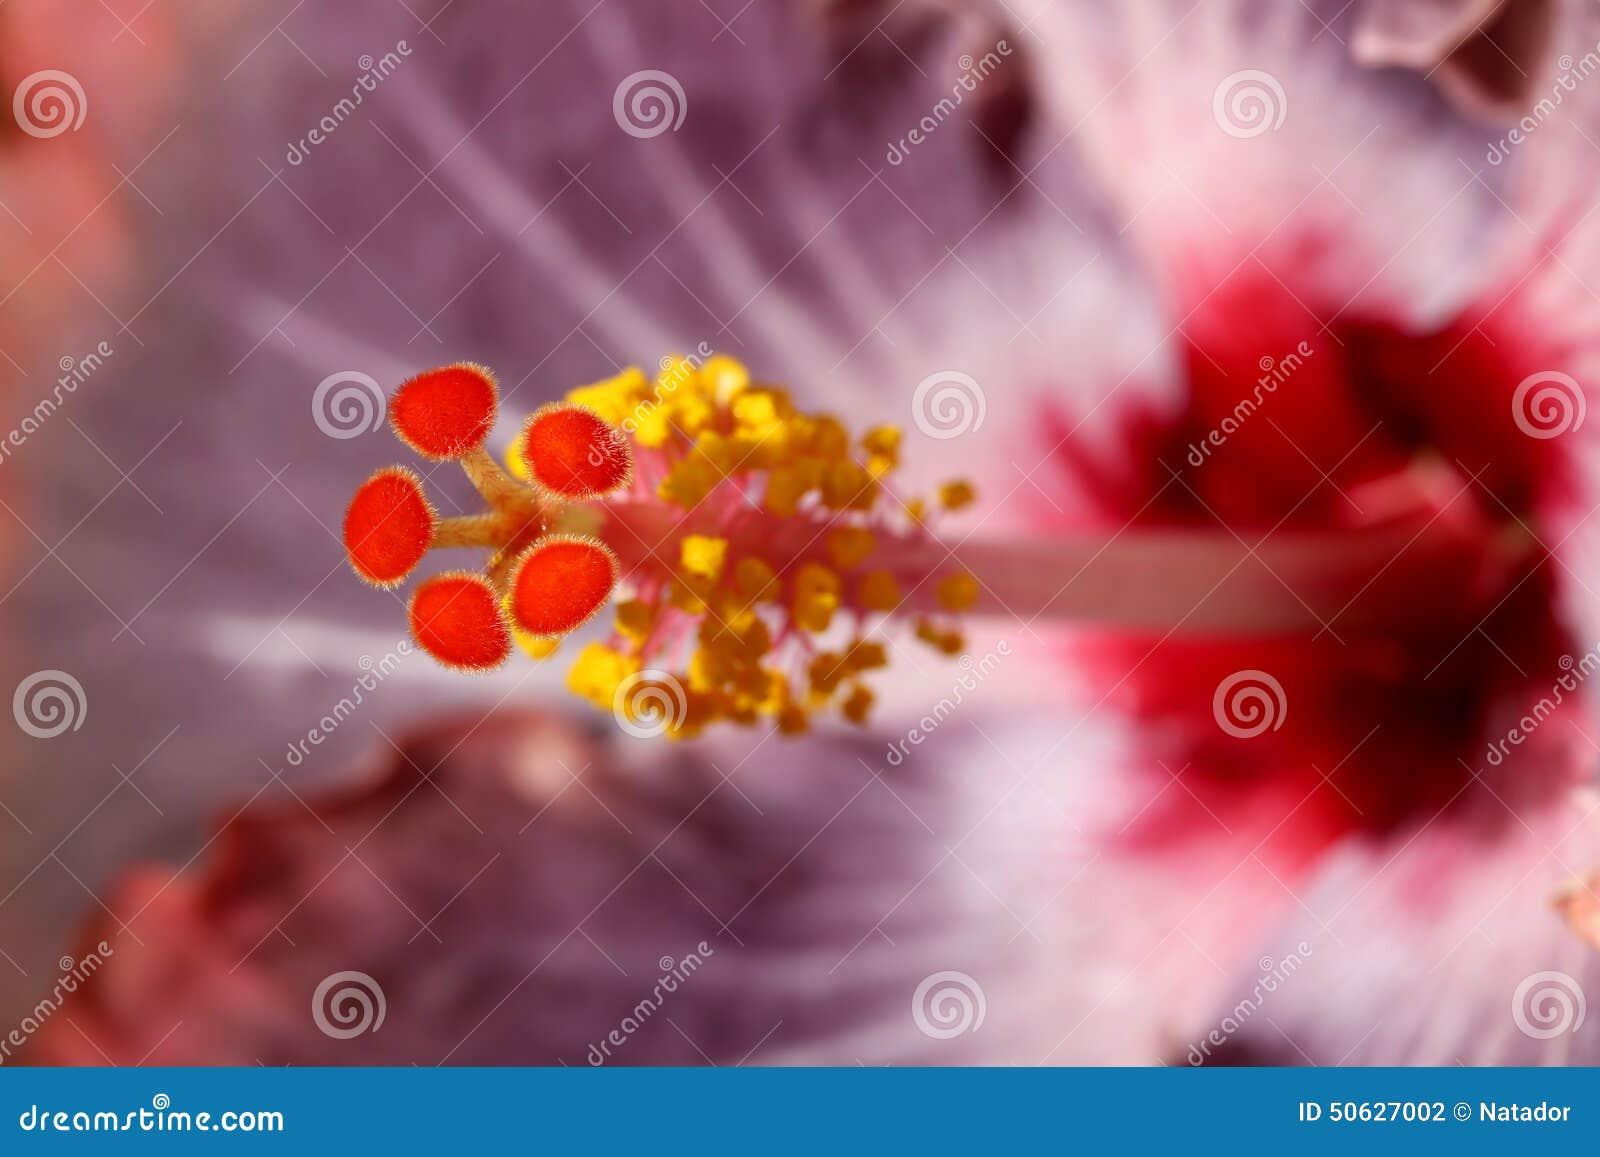 Hibiscus Flower Pestle macro